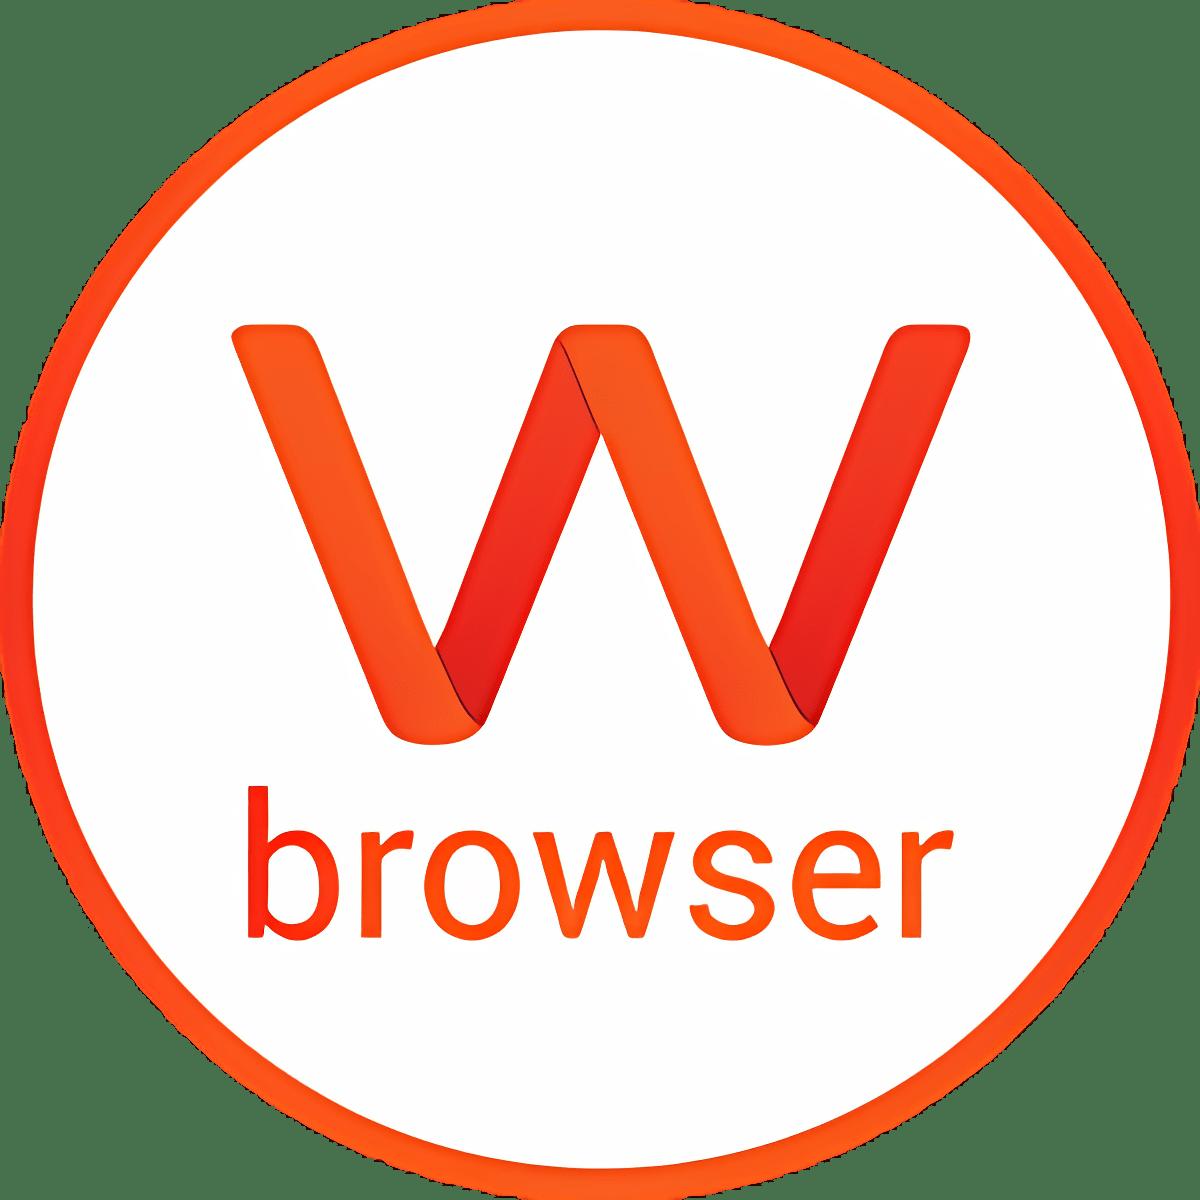 WADA Browser: navegador ligero 2.10.6